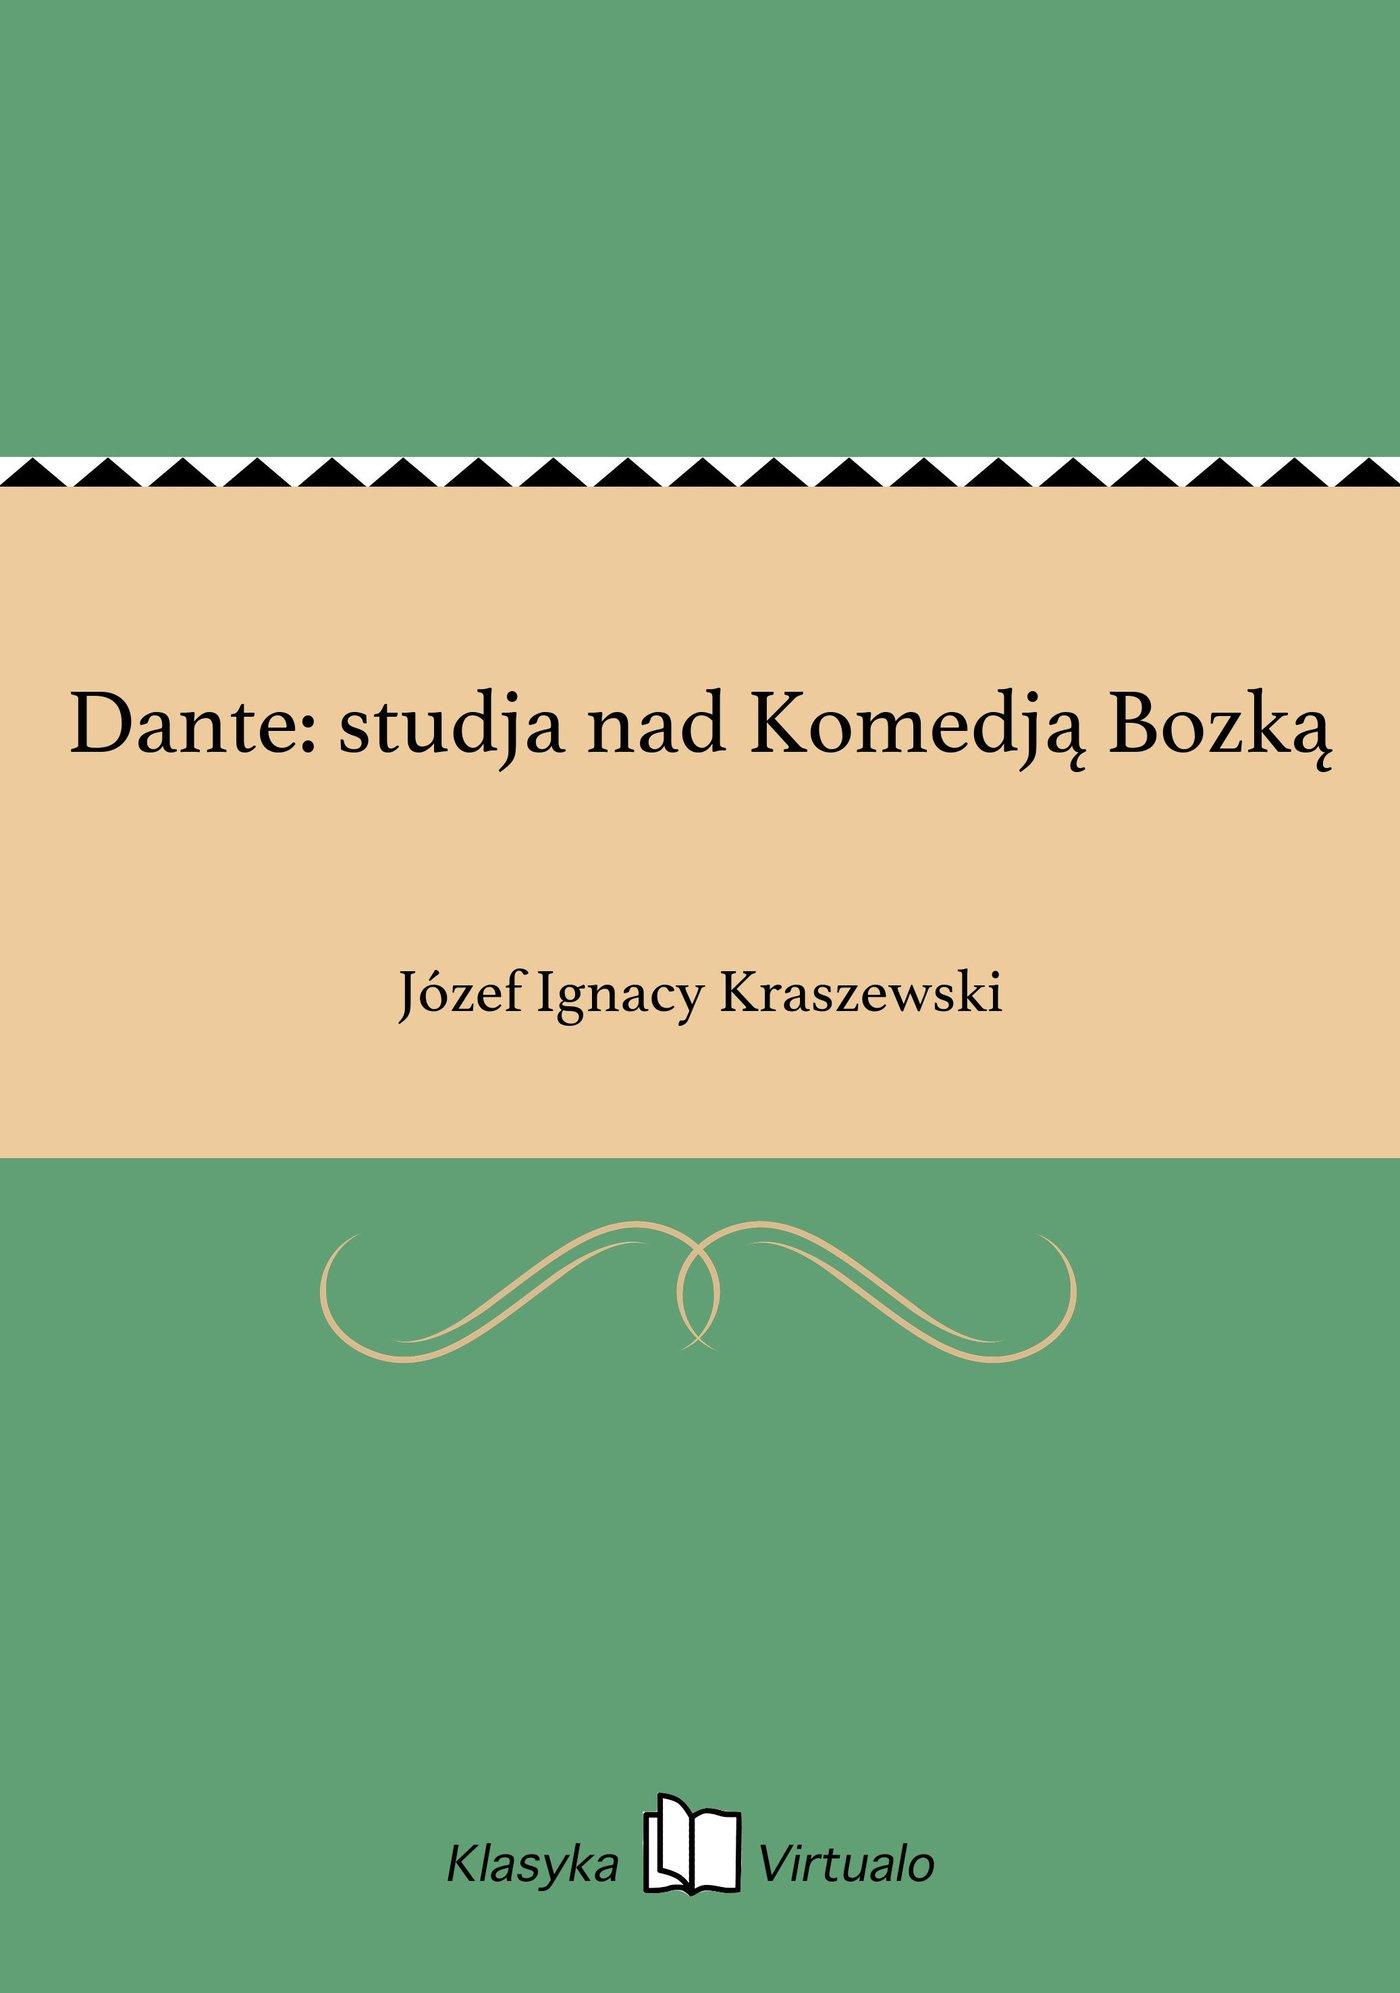 Dante: studja nad Komedją Bozką - Ebook (Książka EPUB) do pobrania w formacie EPUB